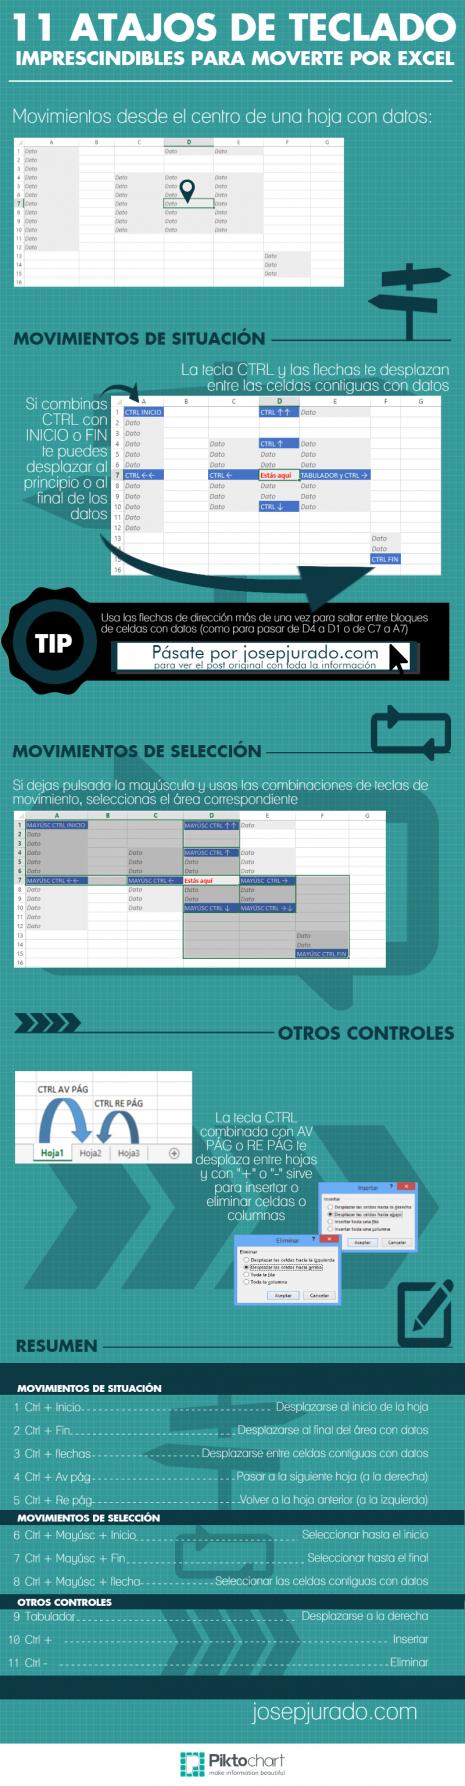 11-atajos-teclado-excel-infografia (1)